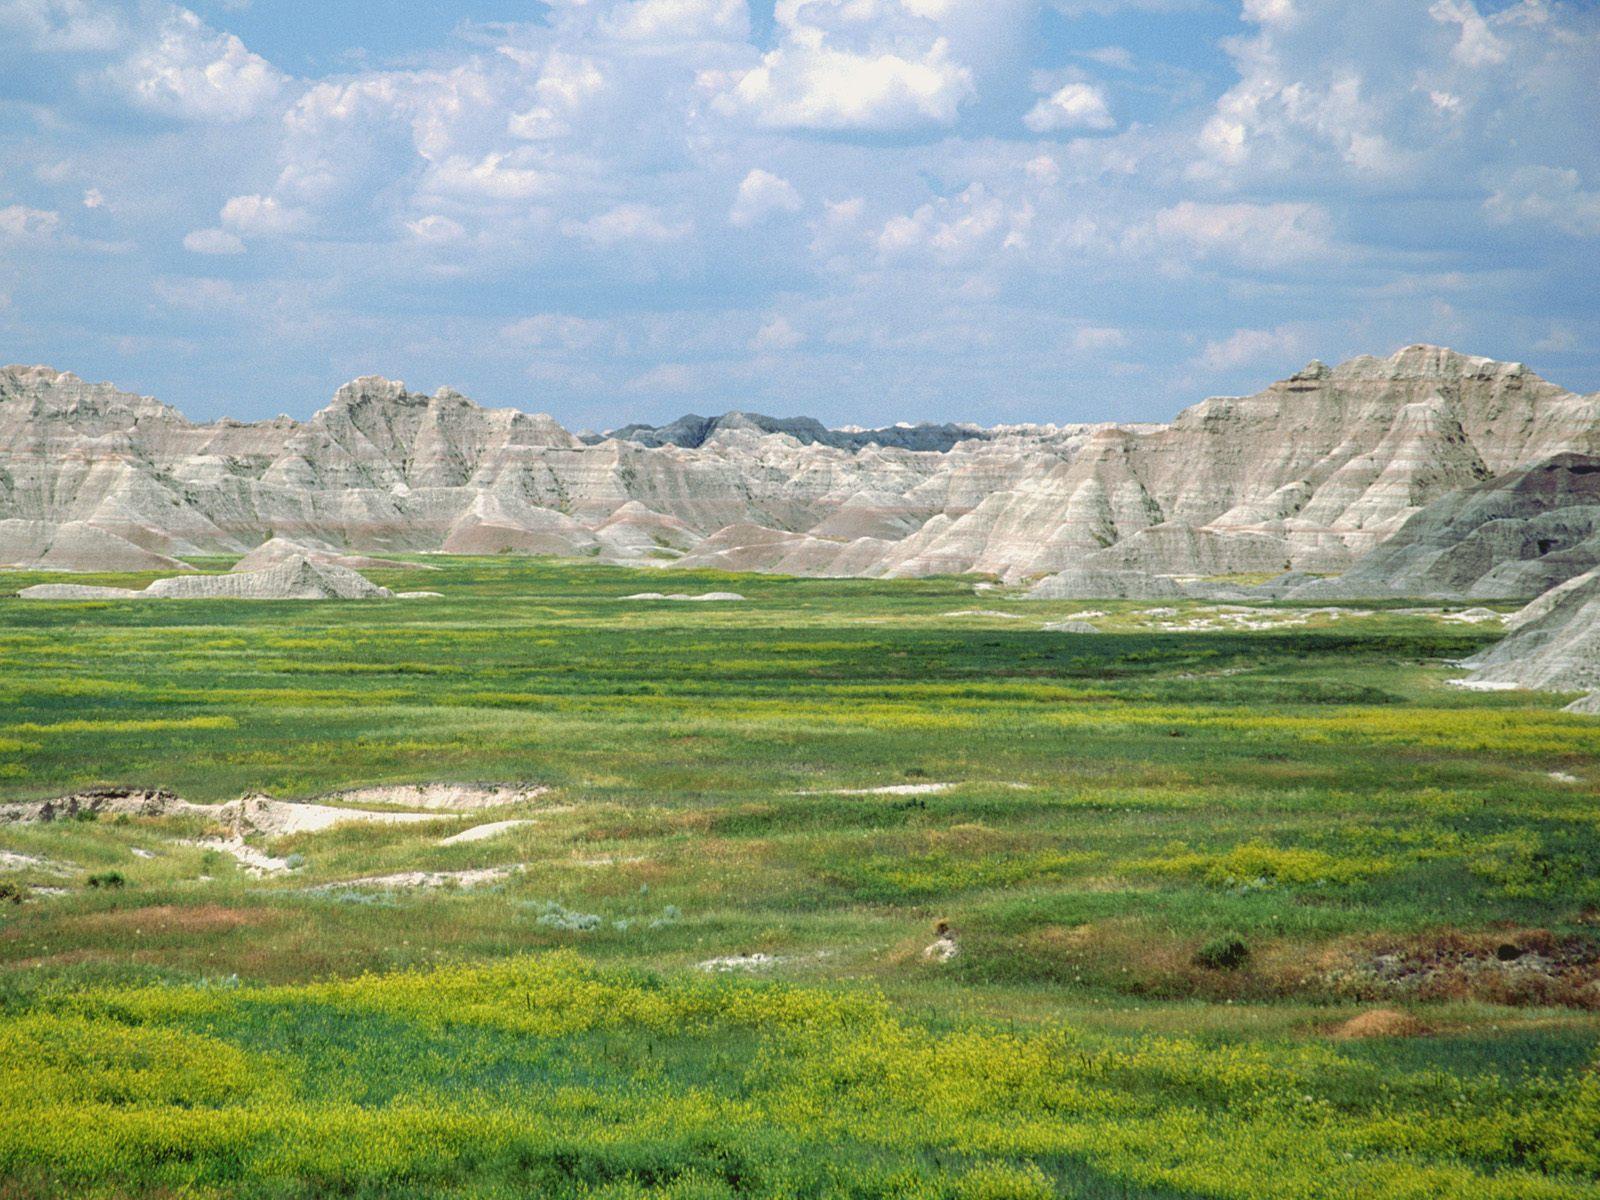 Badlands National Park South Dakota 1600x1200